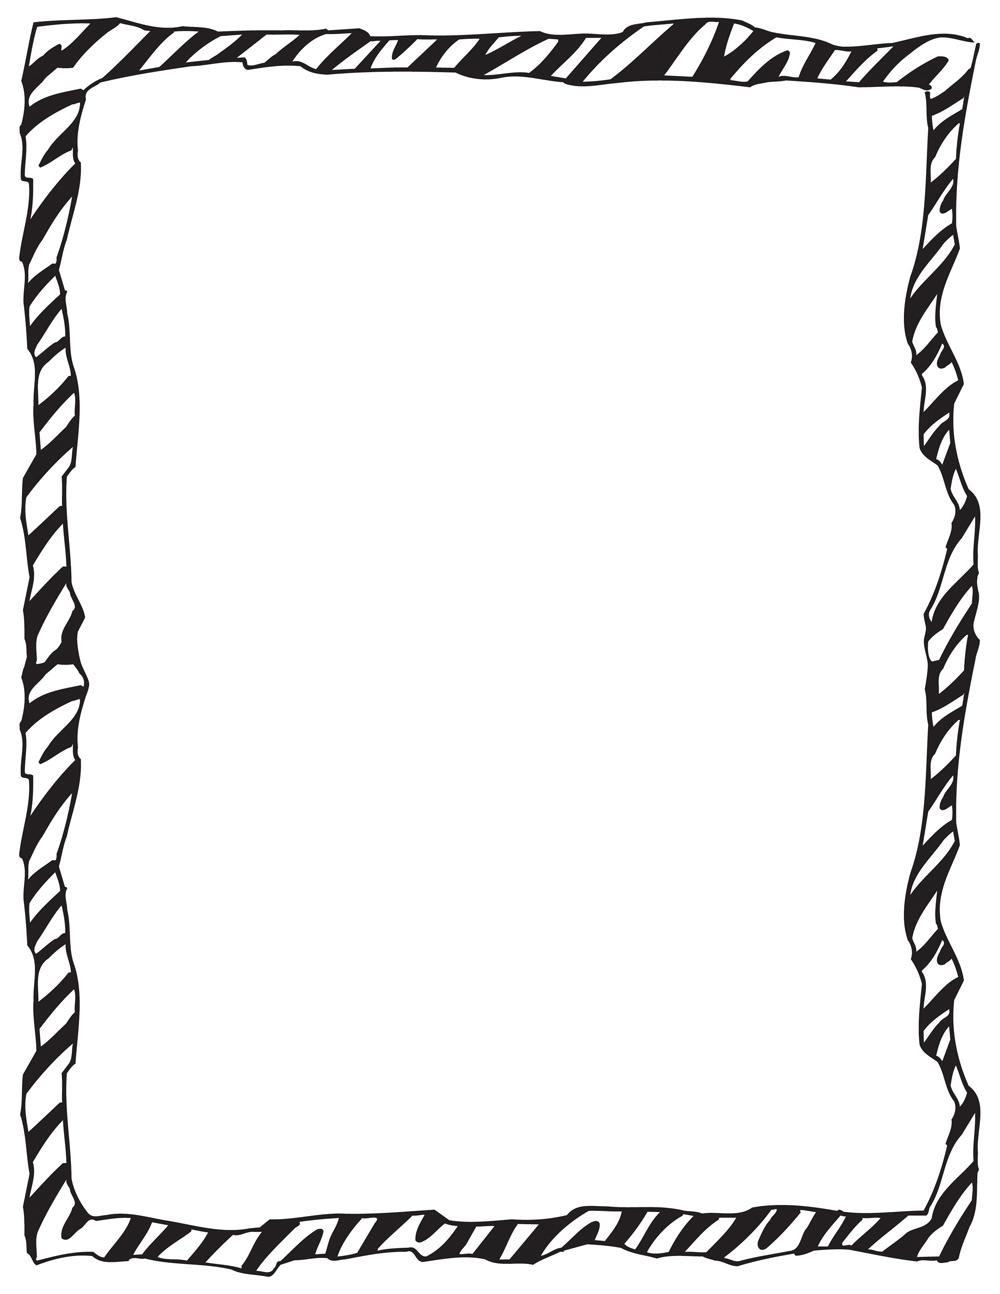 Free Zebra Page Border, Download Free Clip Art, Free Clip Art on.